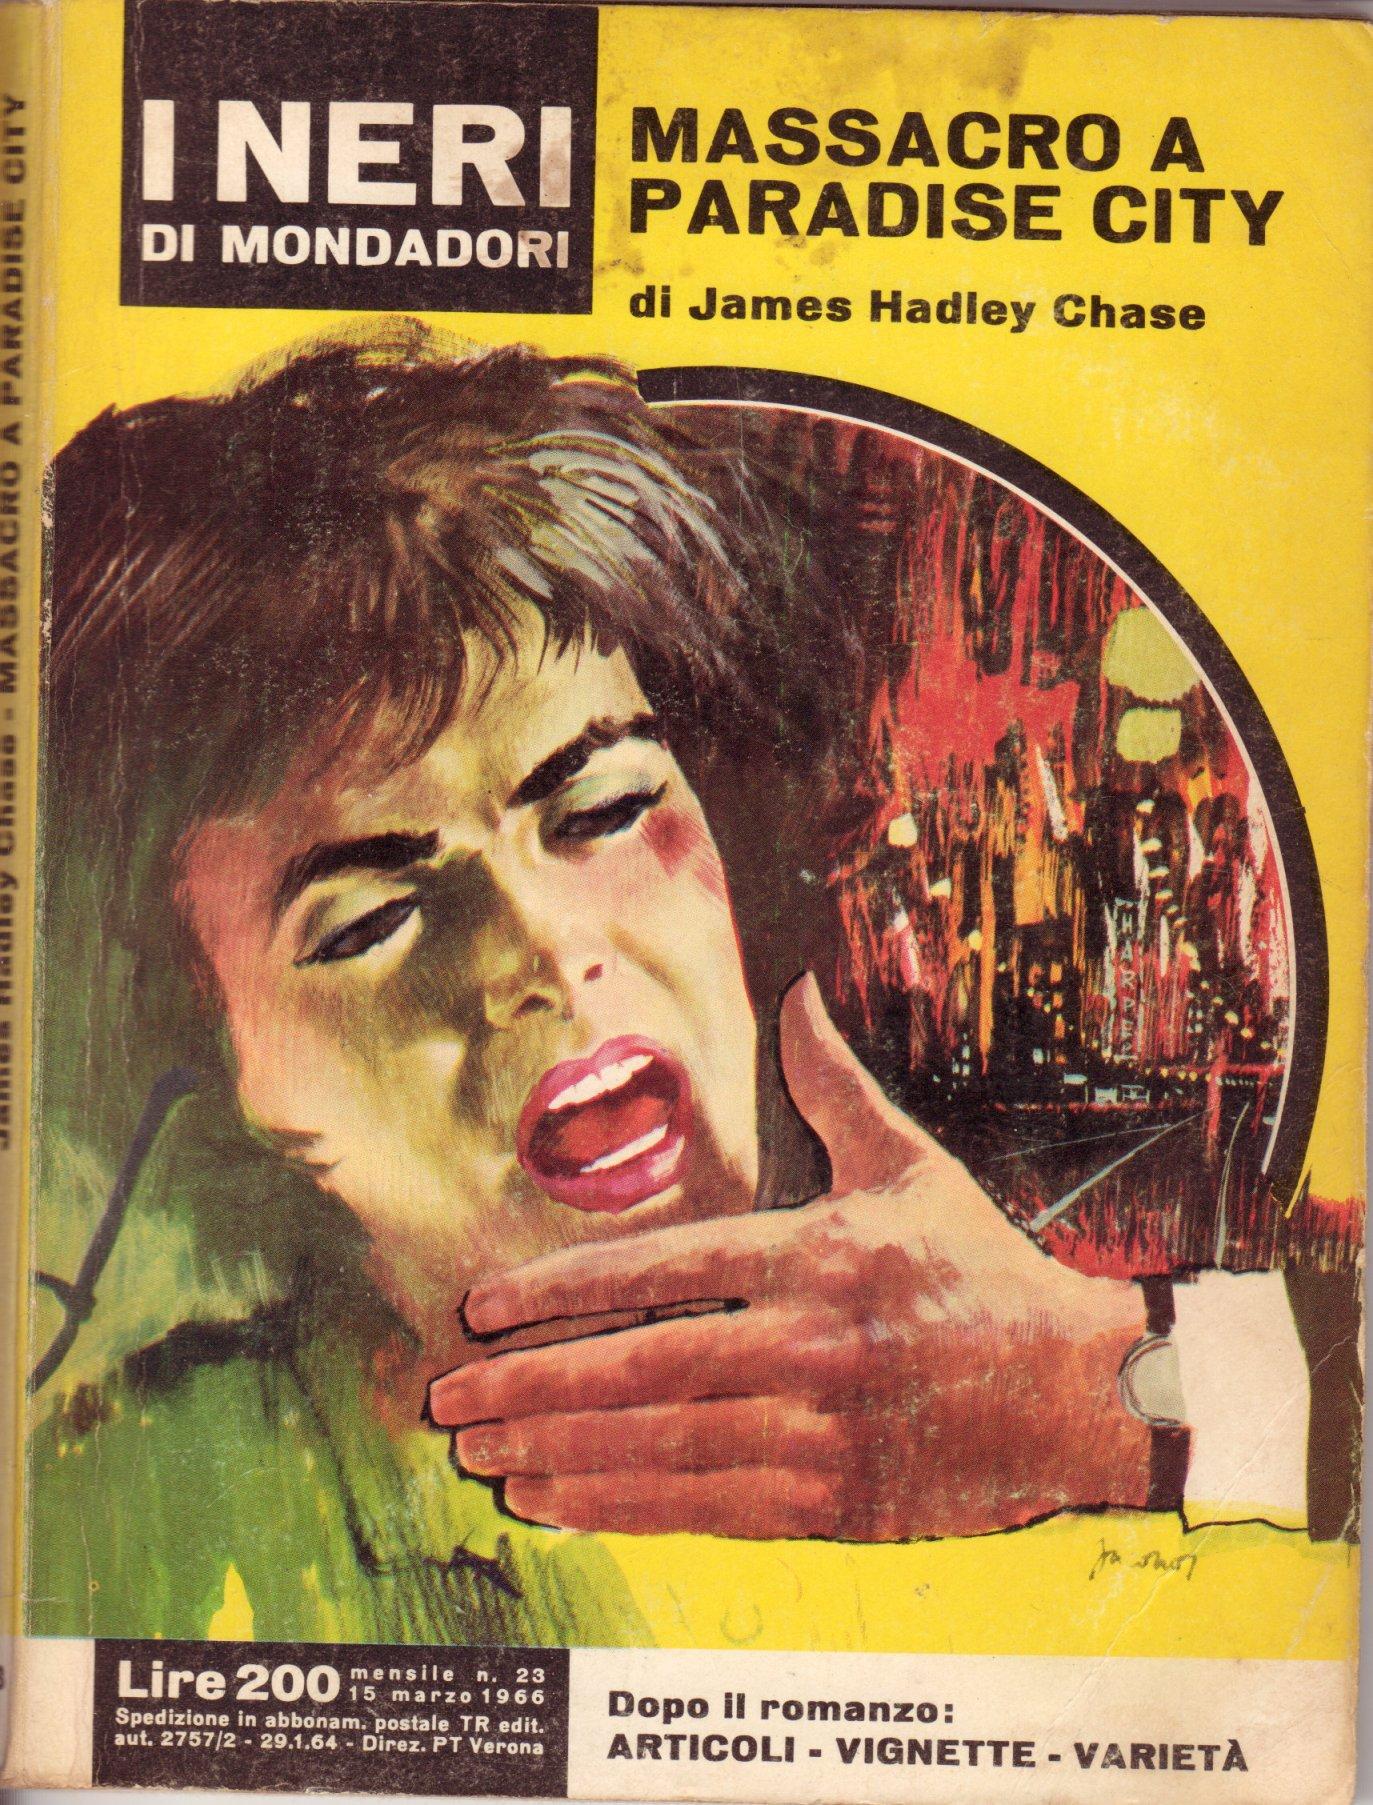 Massacro a Paradise City